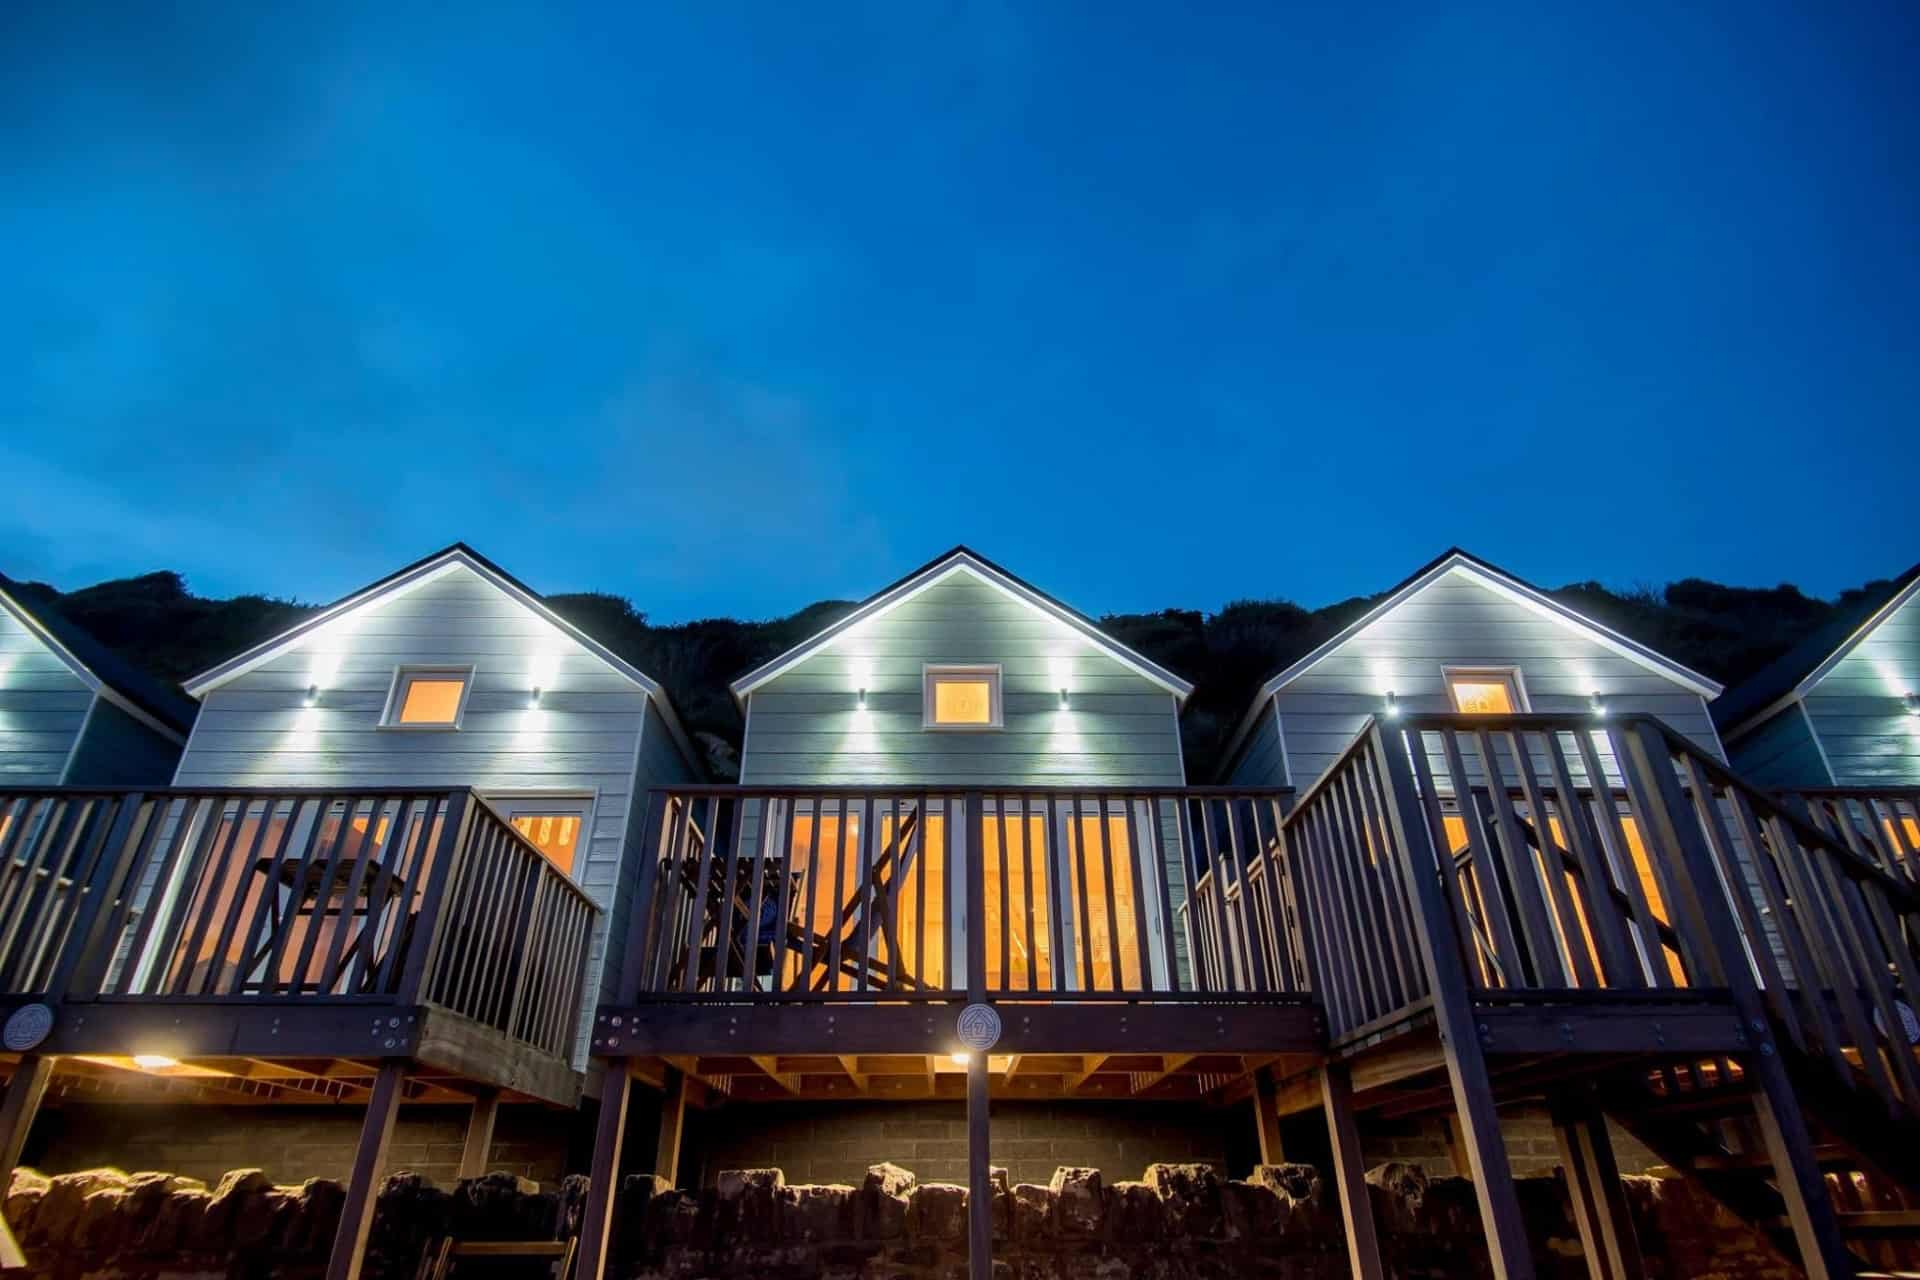 Three beach lodges lit up at night taken form the beach